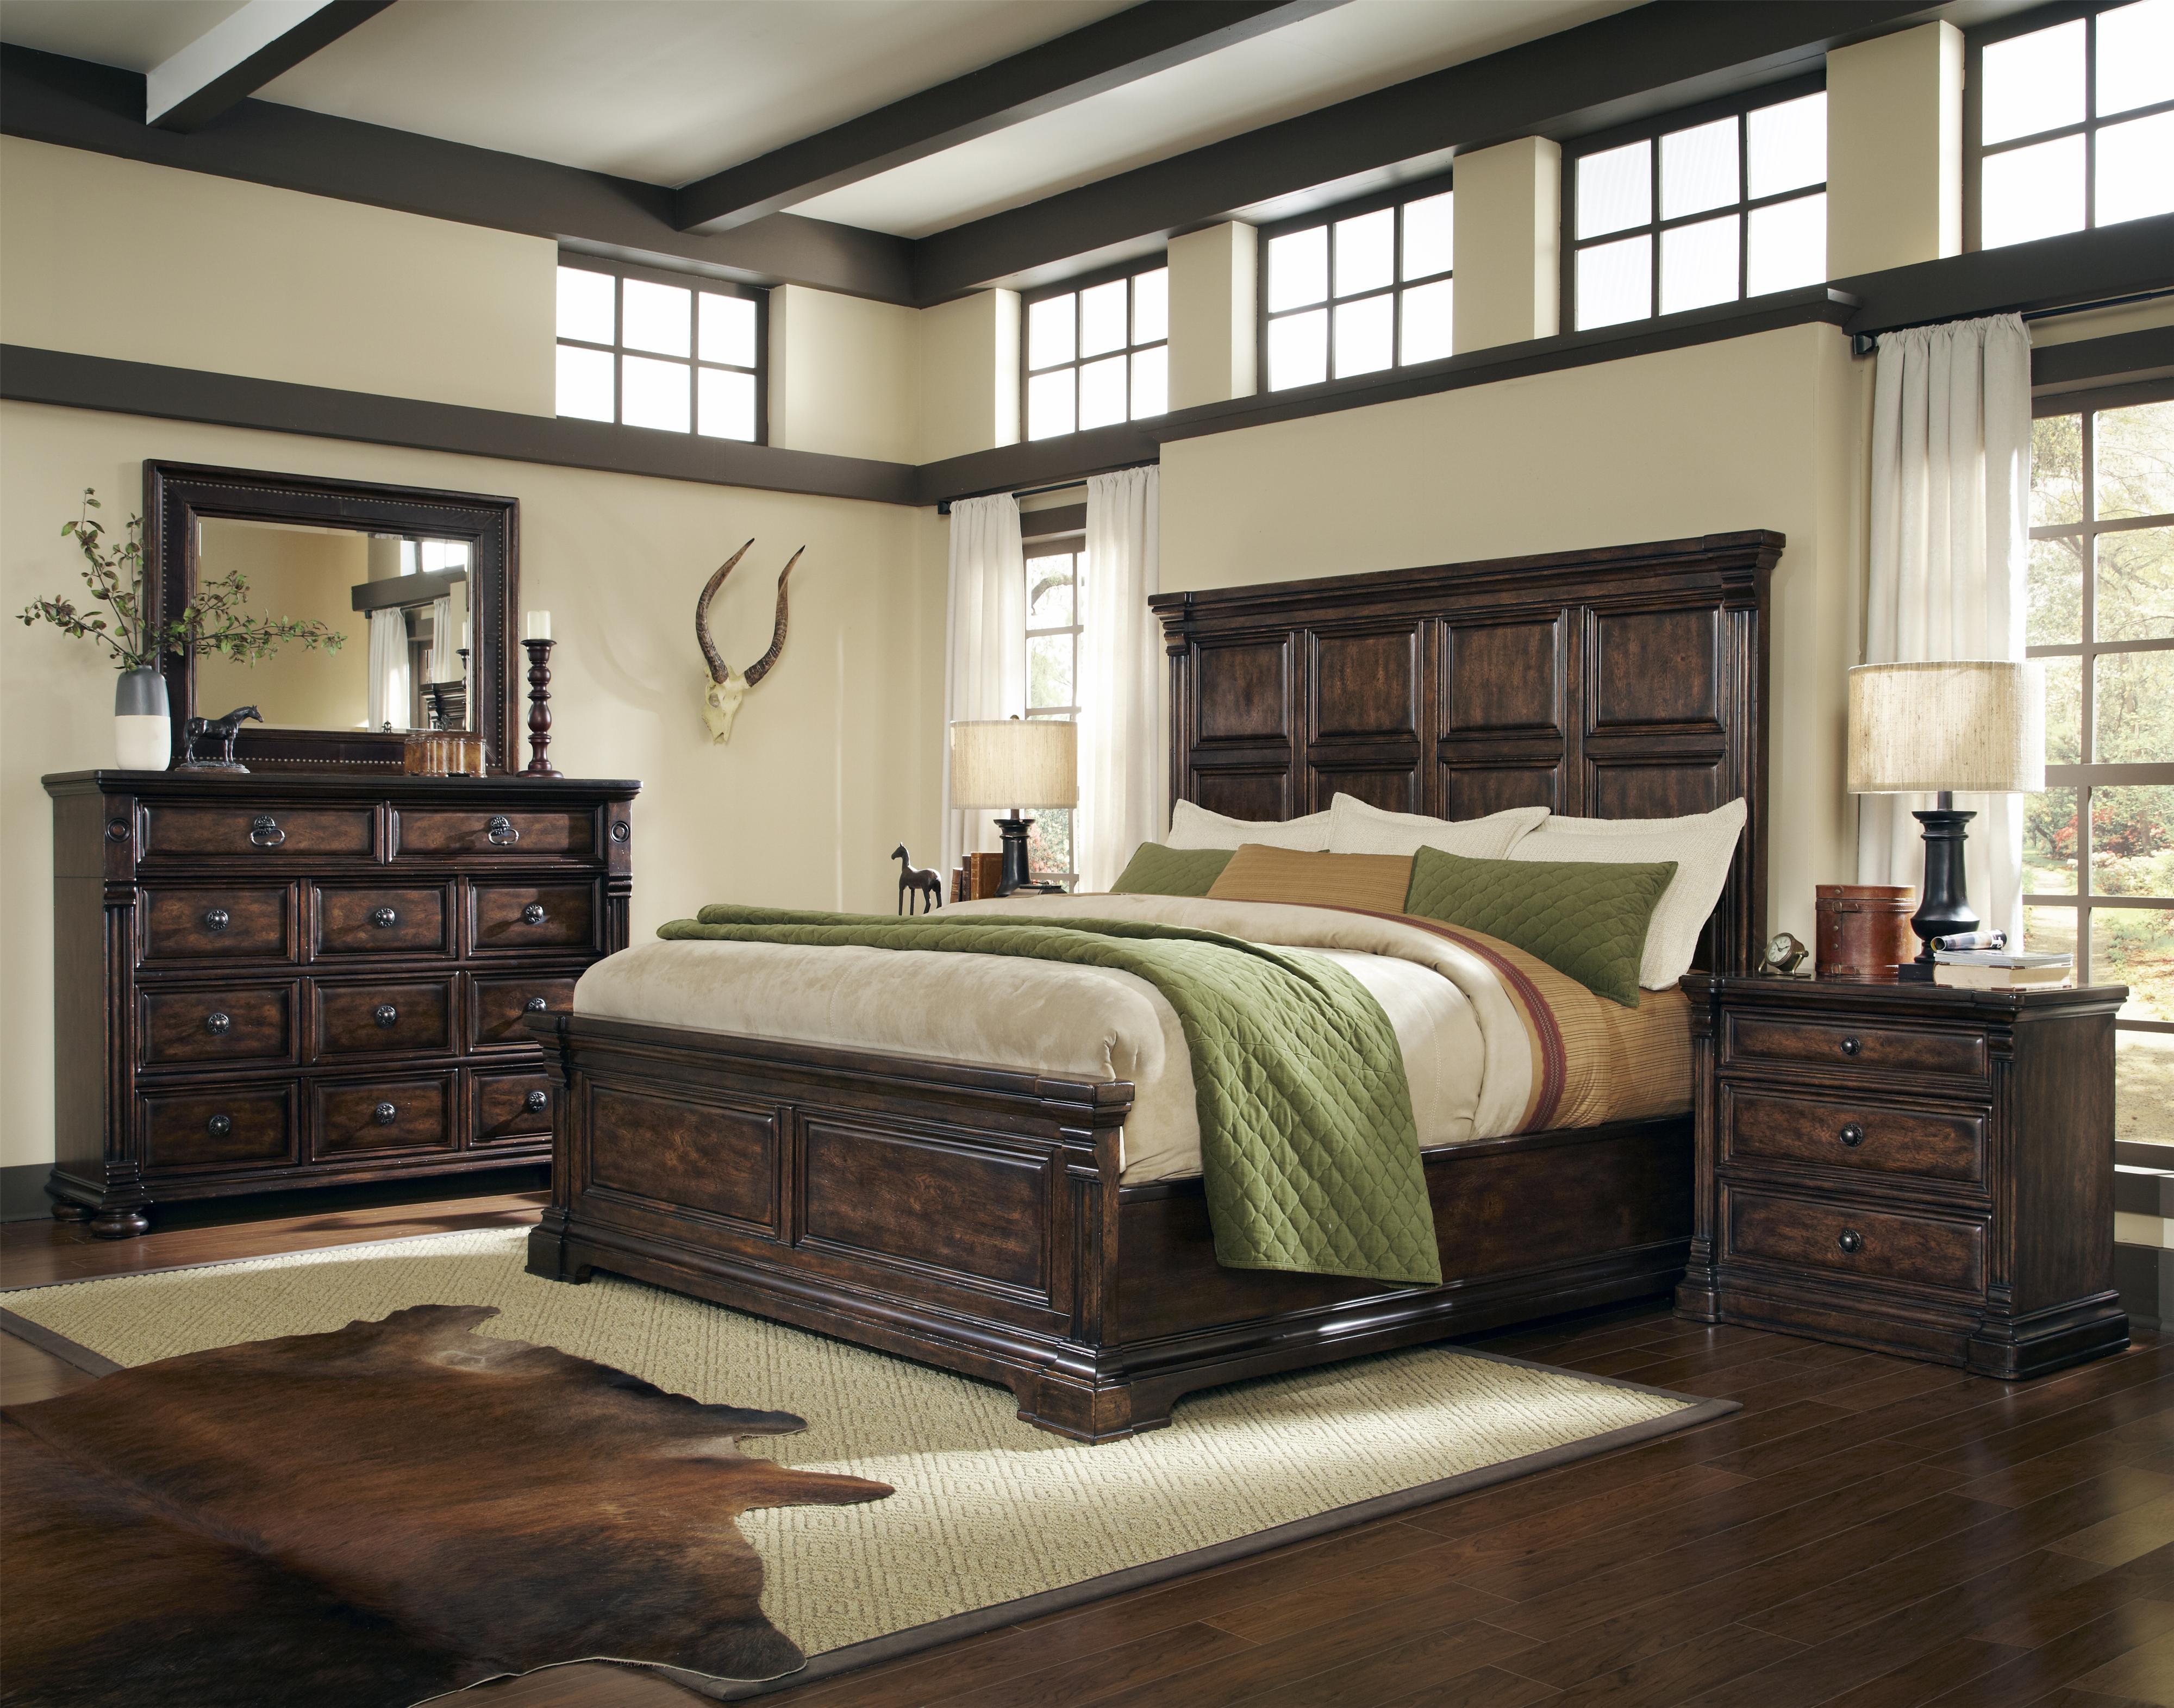 Belfort Signature Belvedere King Bedroom Group - Item Number: 205000 K Bedroom Group 1